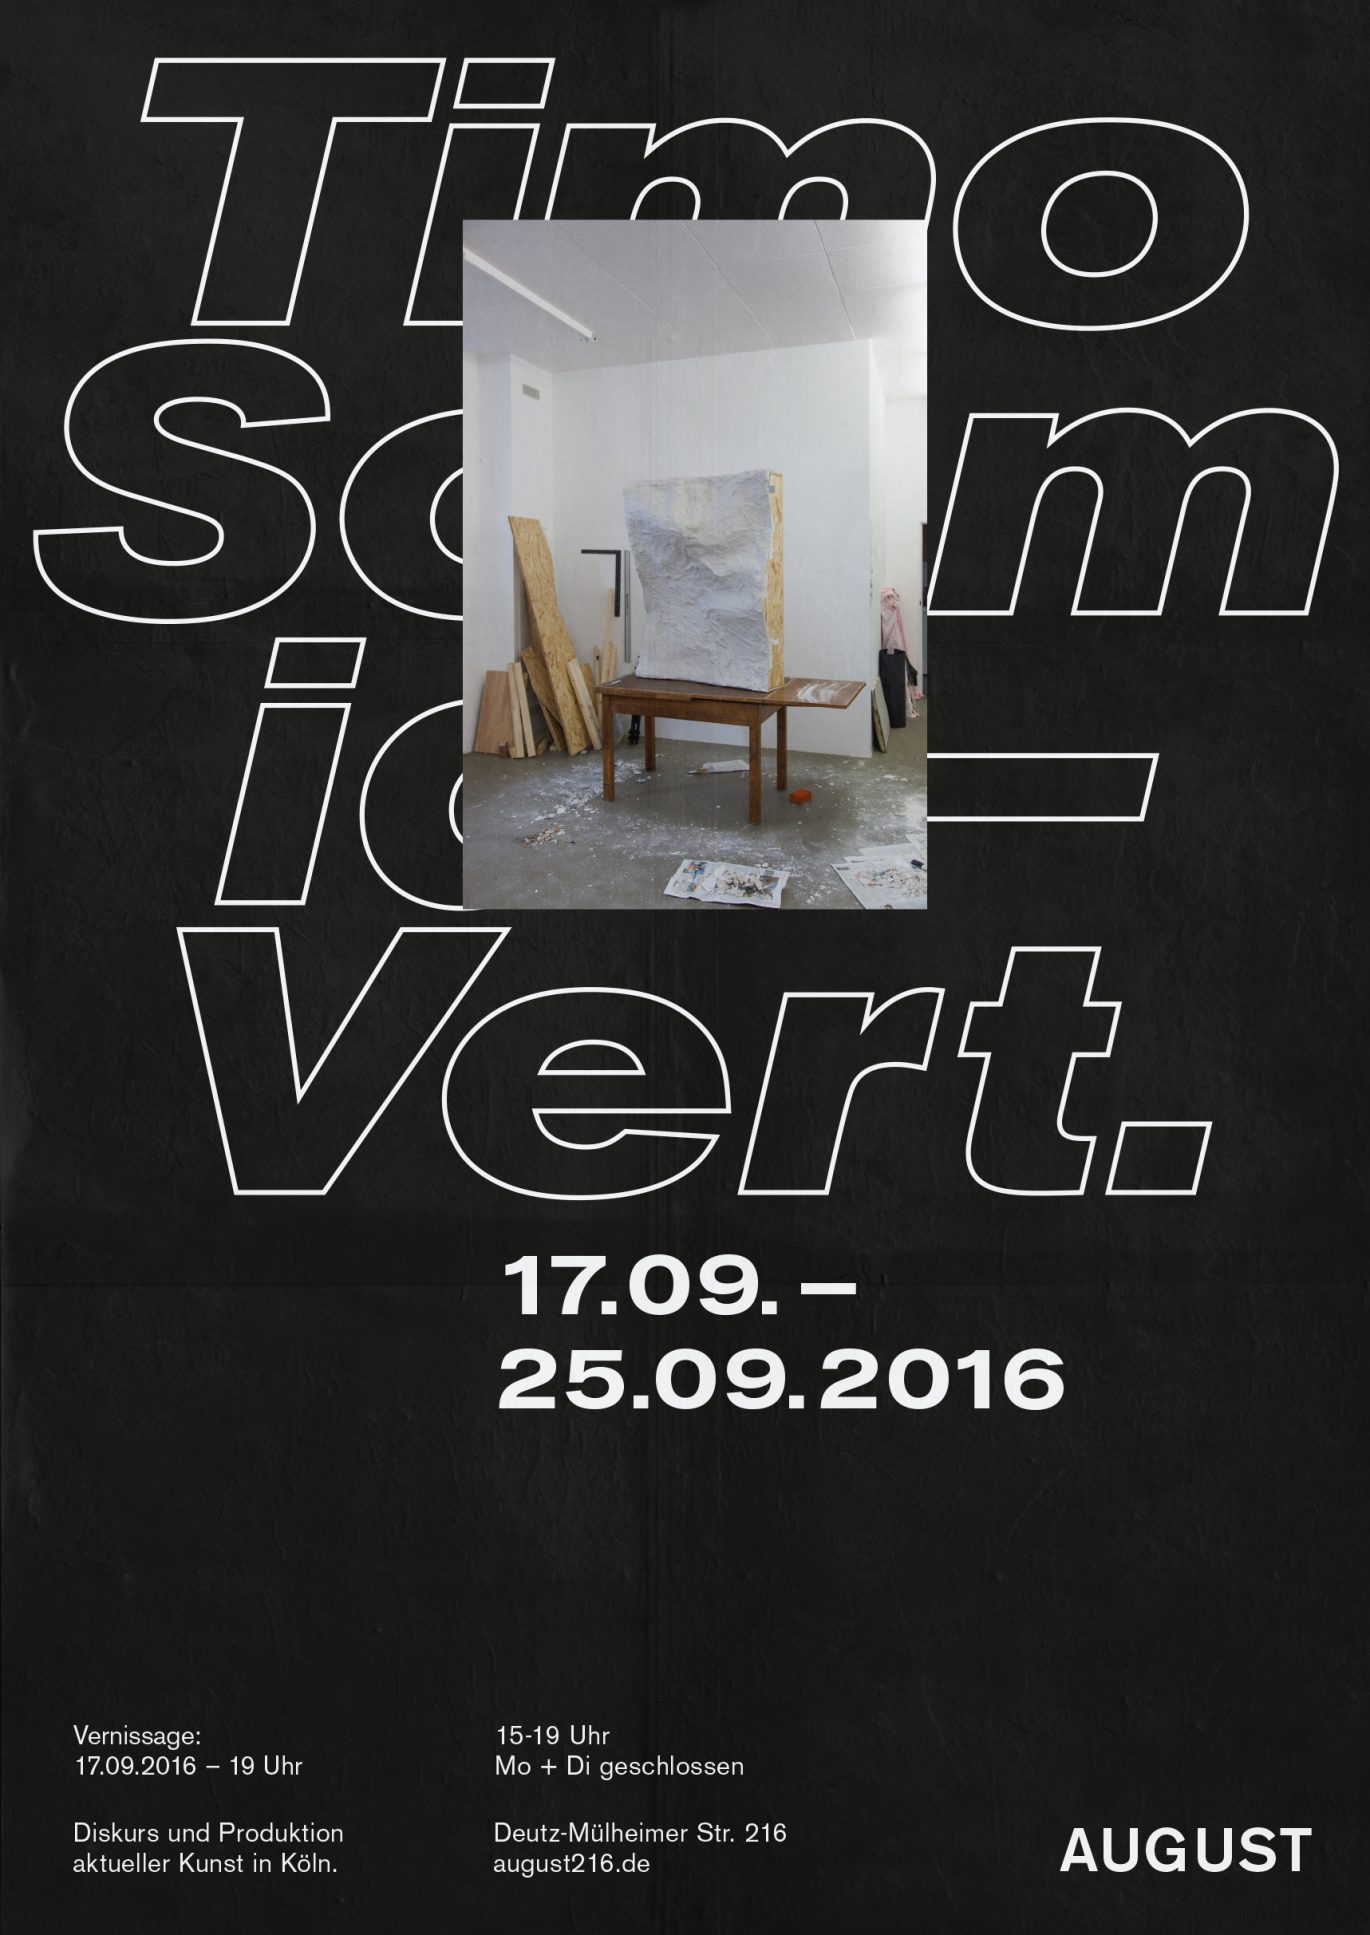 Timo Schmidt | Plakat |Design | Schrift |Schwarz